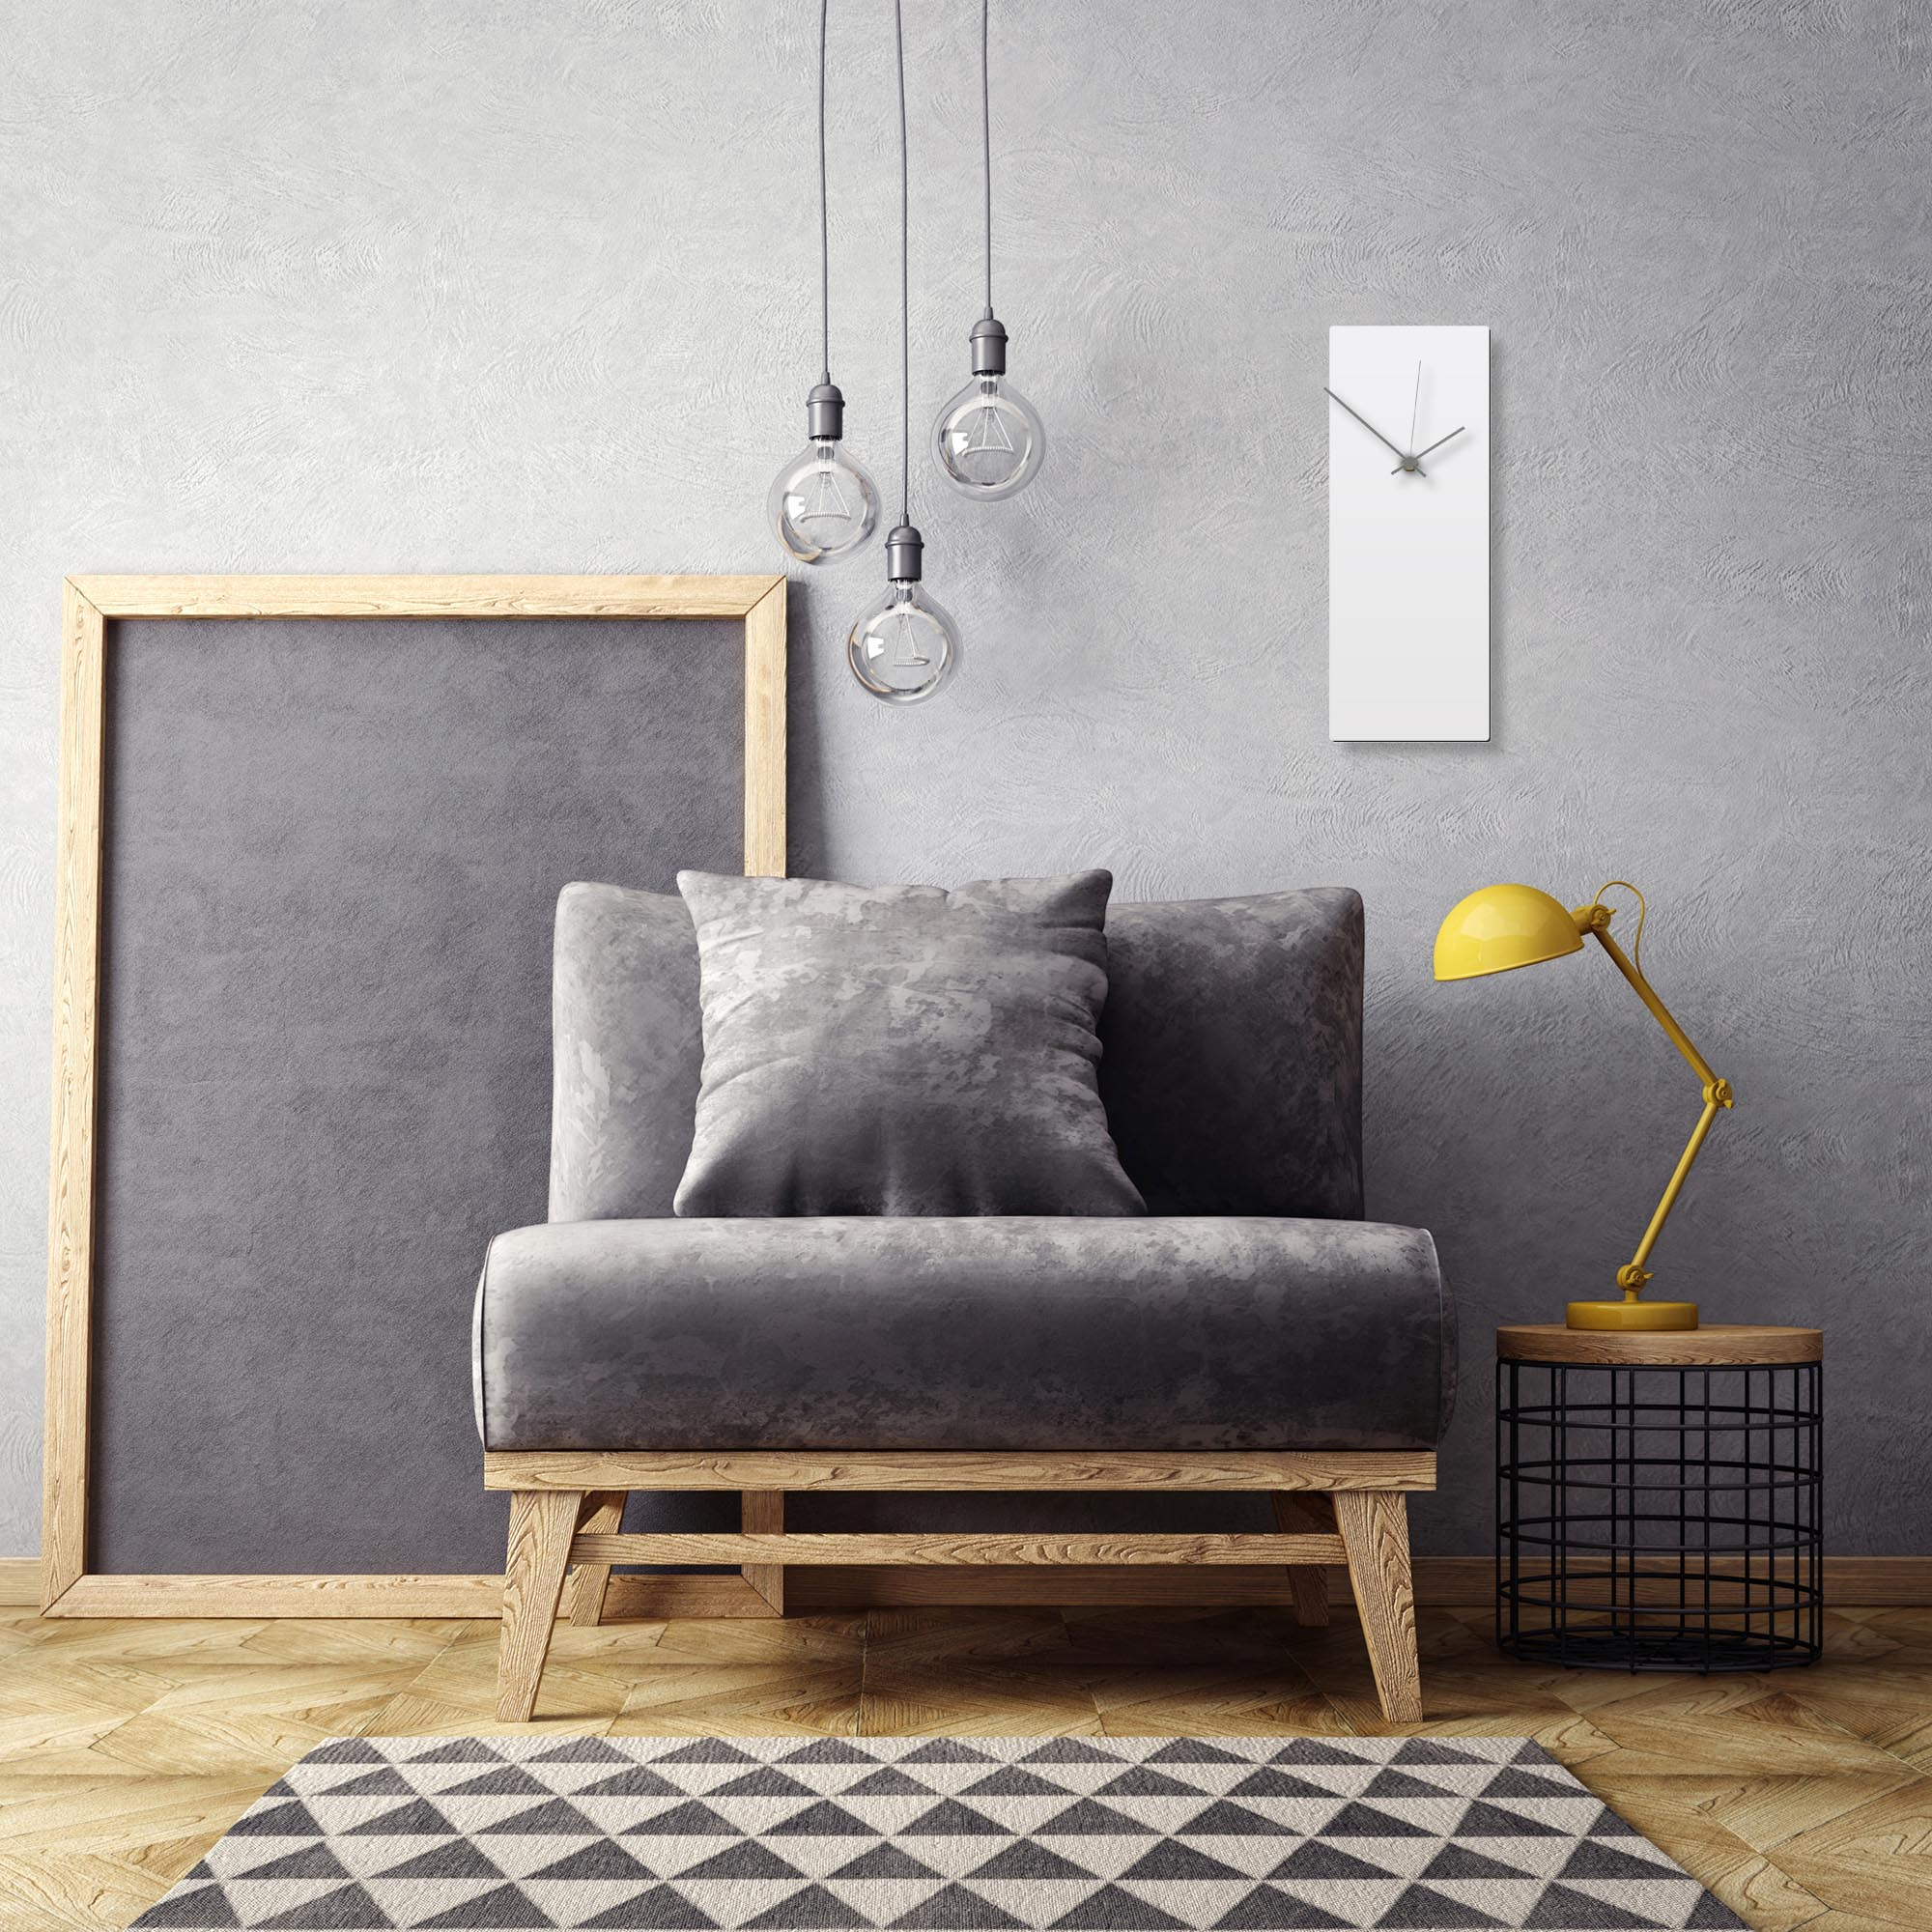 Whiteout Grey Clock by Adam Schwoeppe Contemporary Clock on Aluminum Polymetal - Alternate View 1